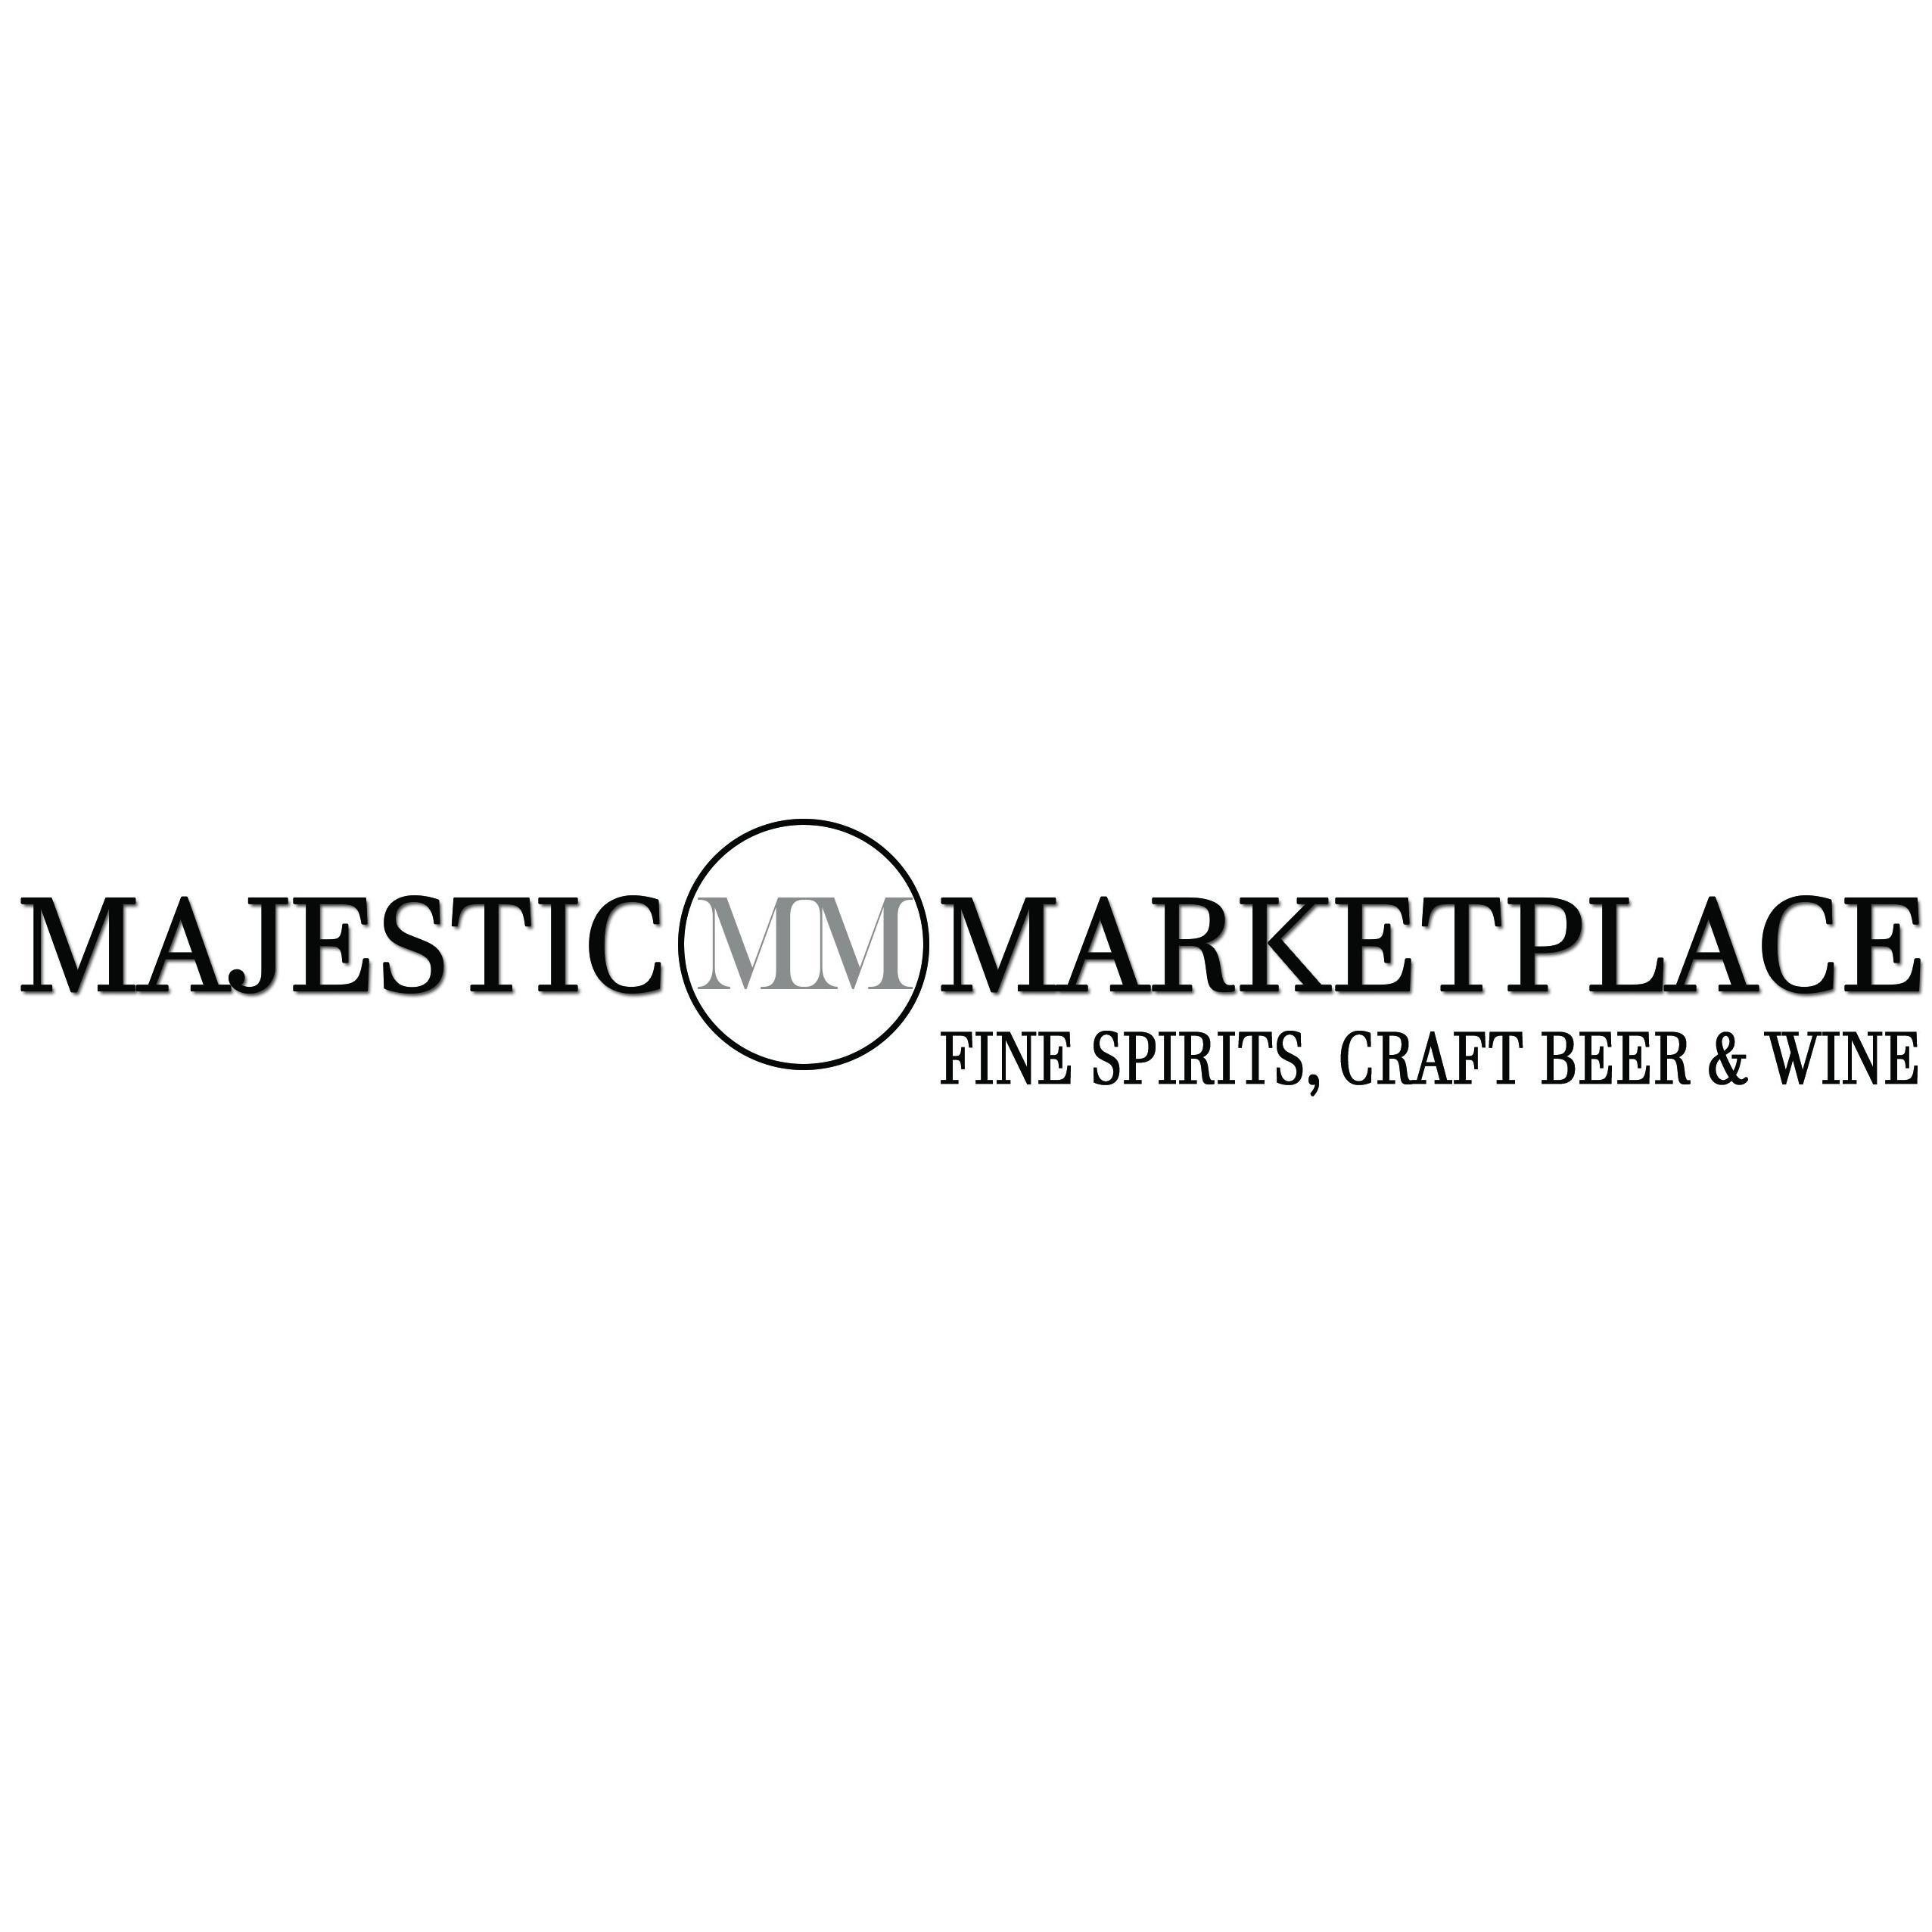 Majestic Marketplace